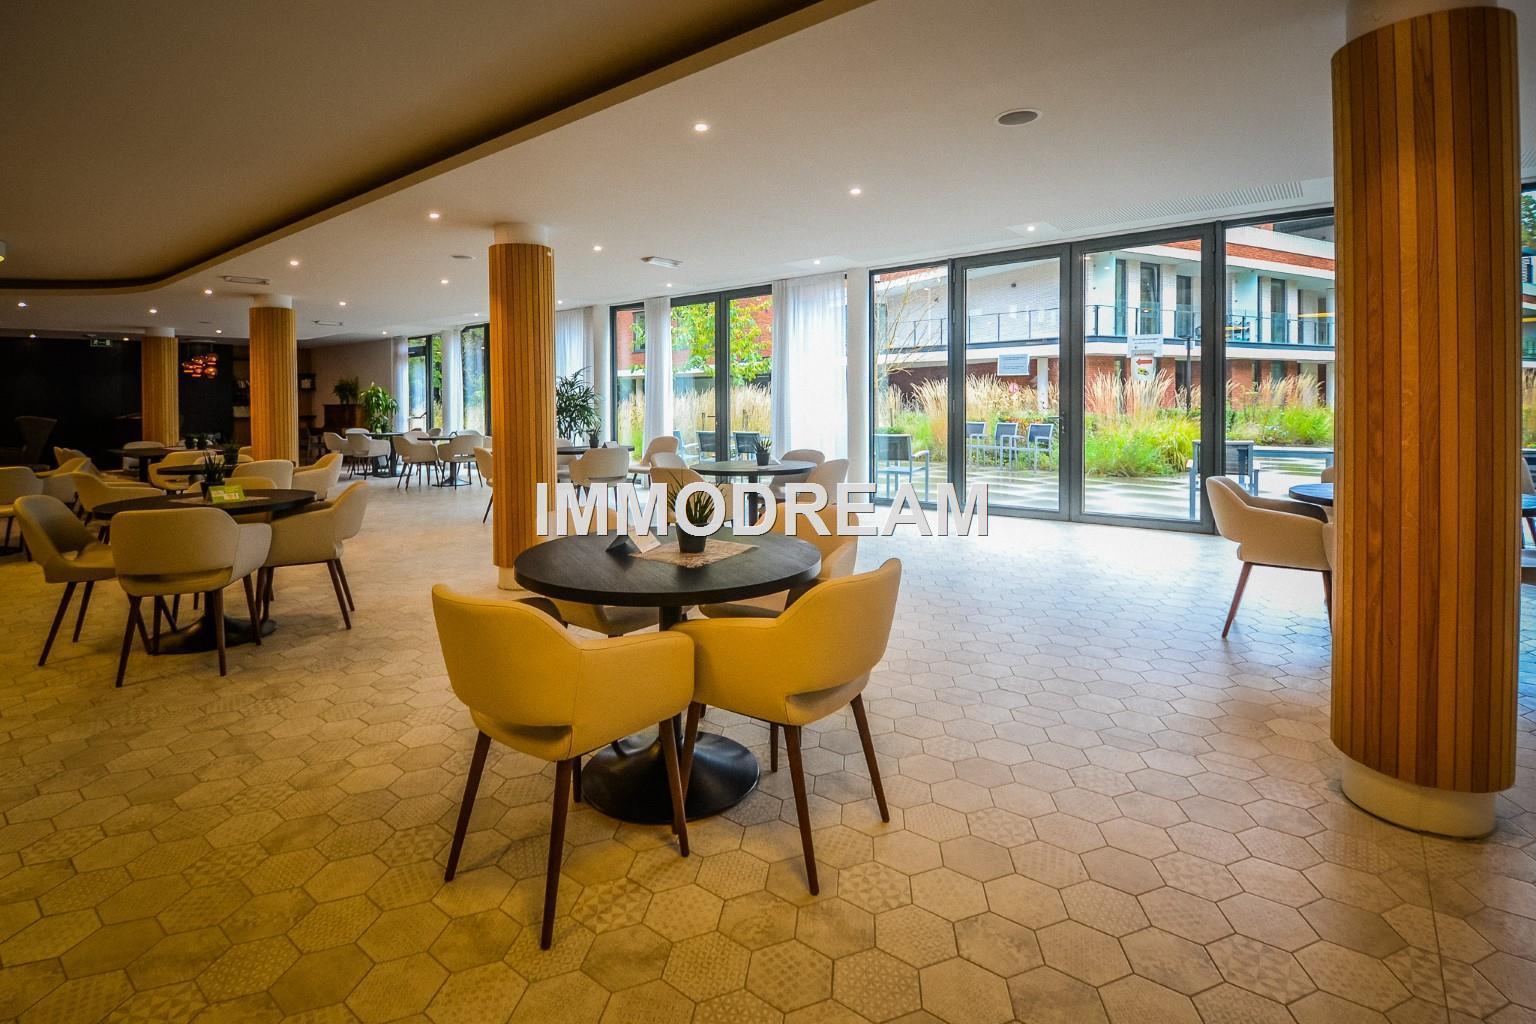 Residences-services - Wezembeek-Oppem - #3909185-9